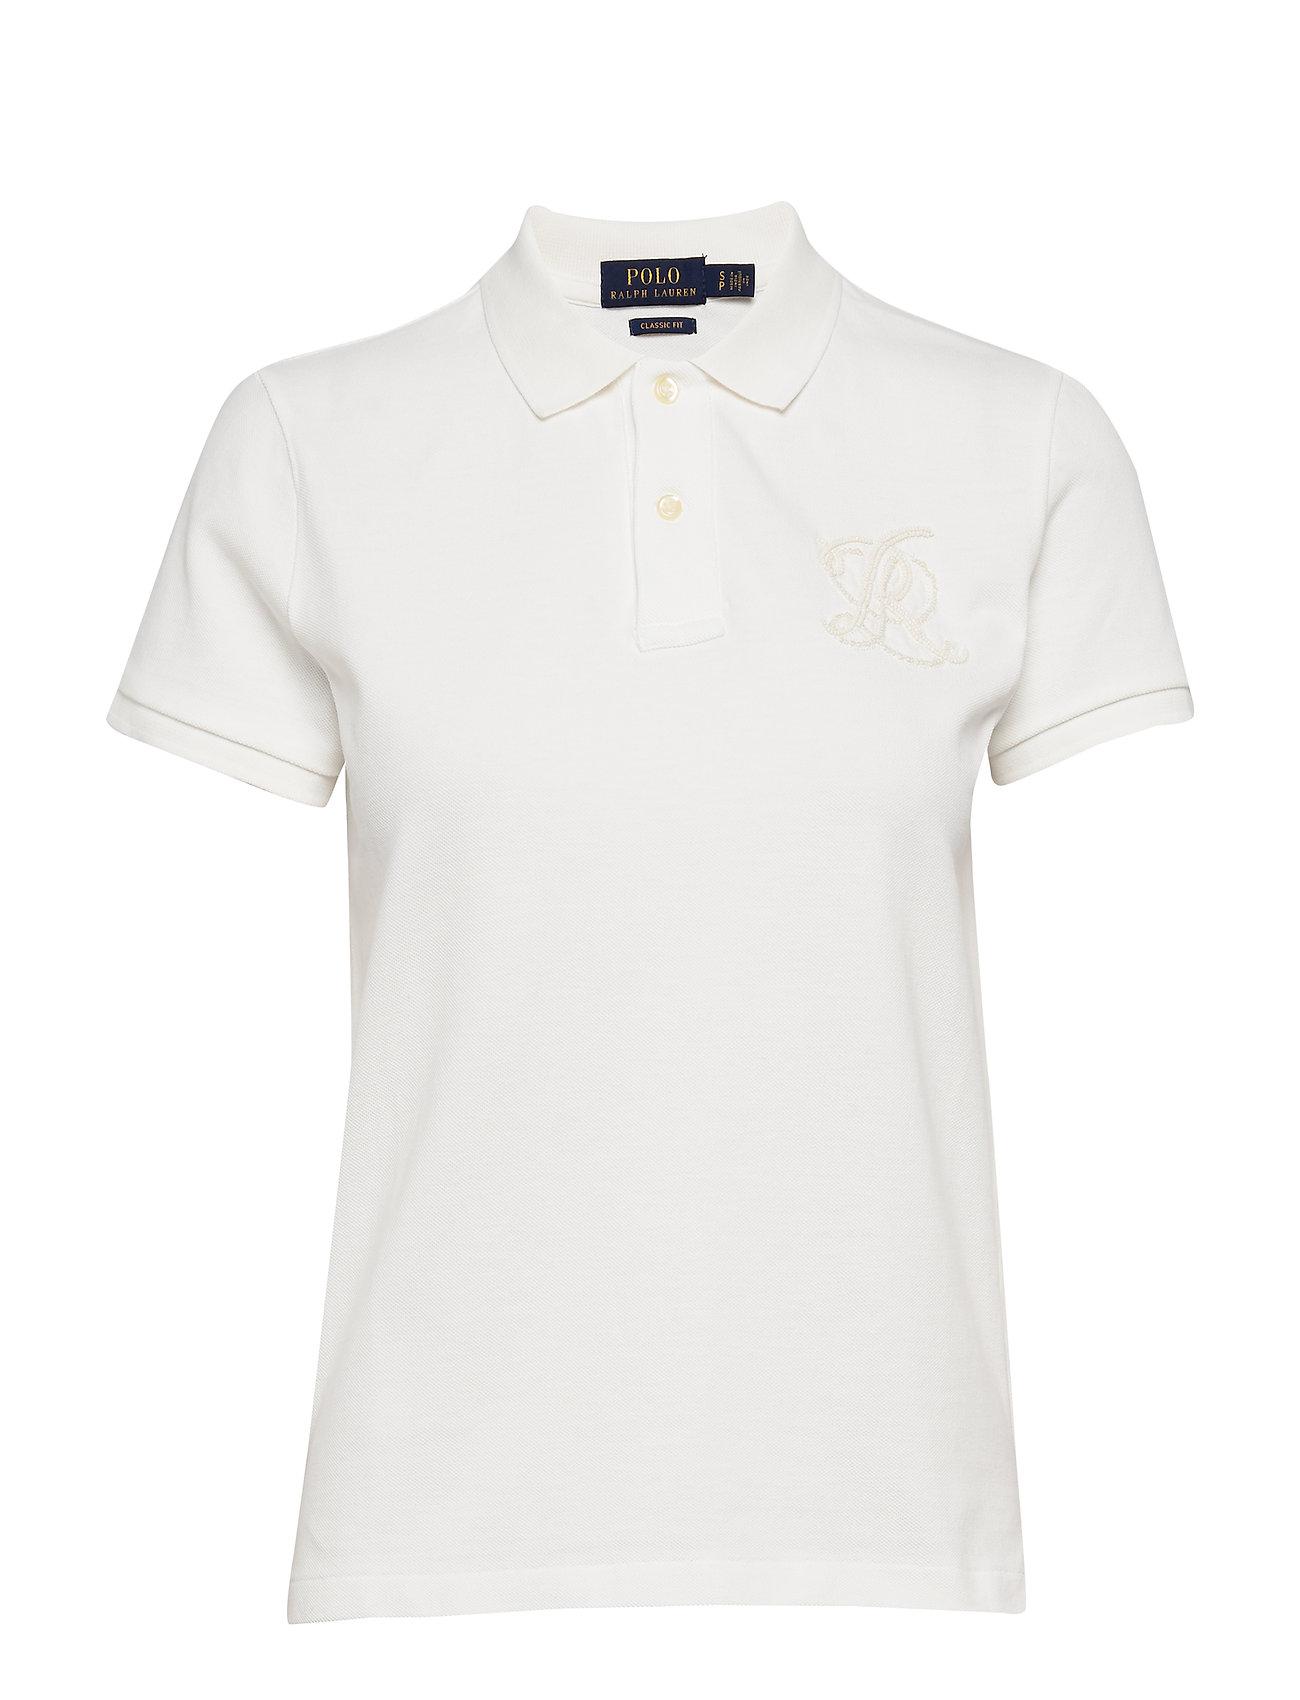 Polo Ralph Lauren Classic Fit Beaded Polo Shirt - DECKWASH WHITE